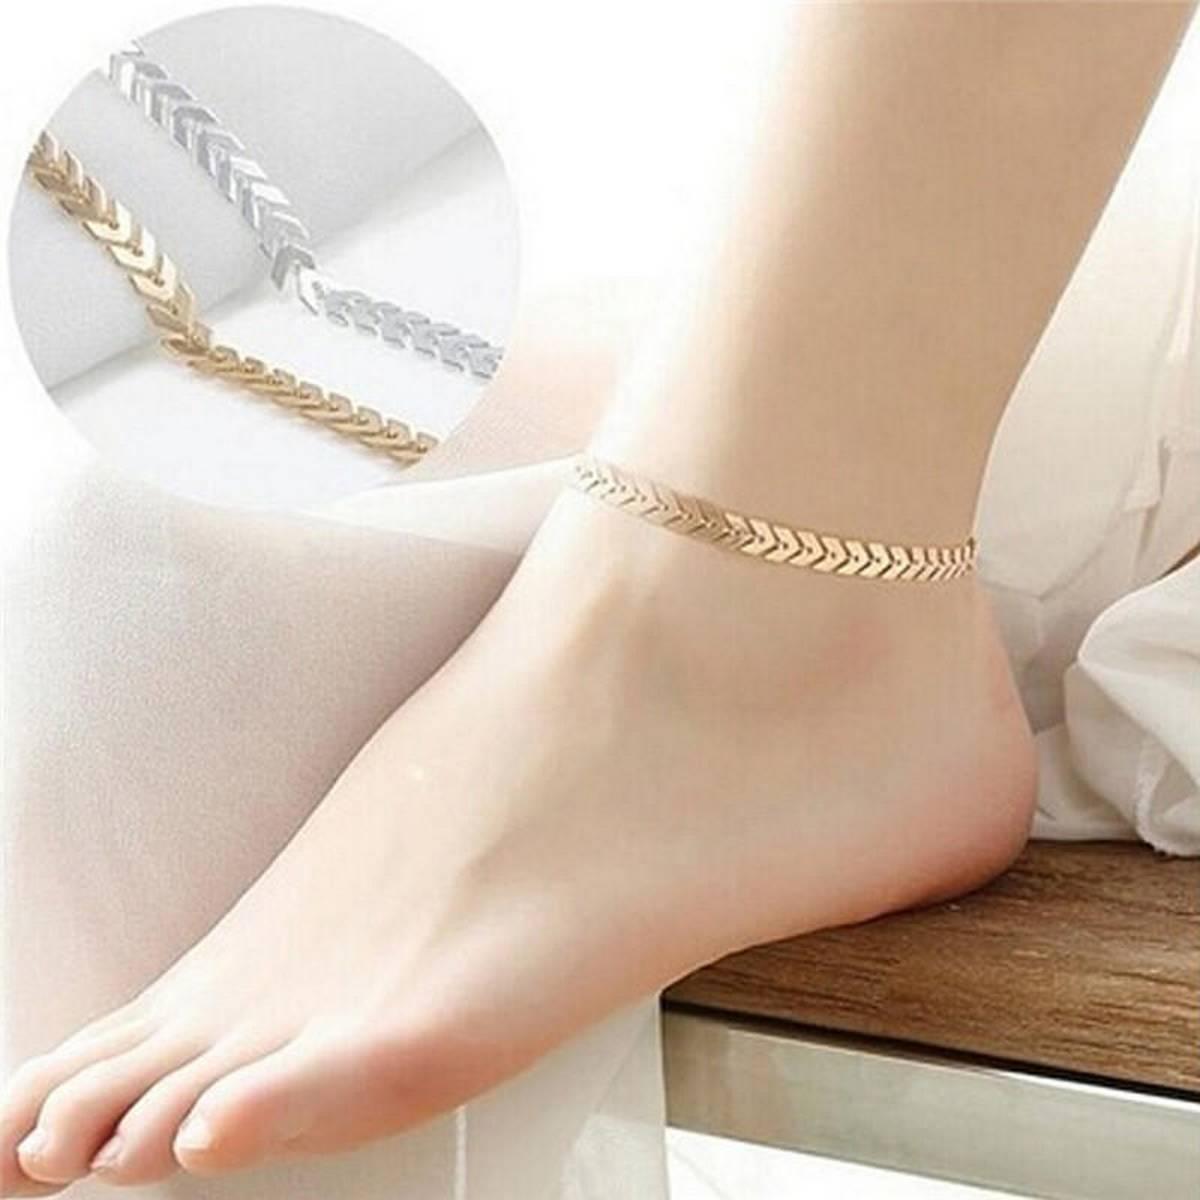 Arrow Ankle Chain Anklet Bracelet Foot Jewelry Sandal Beach